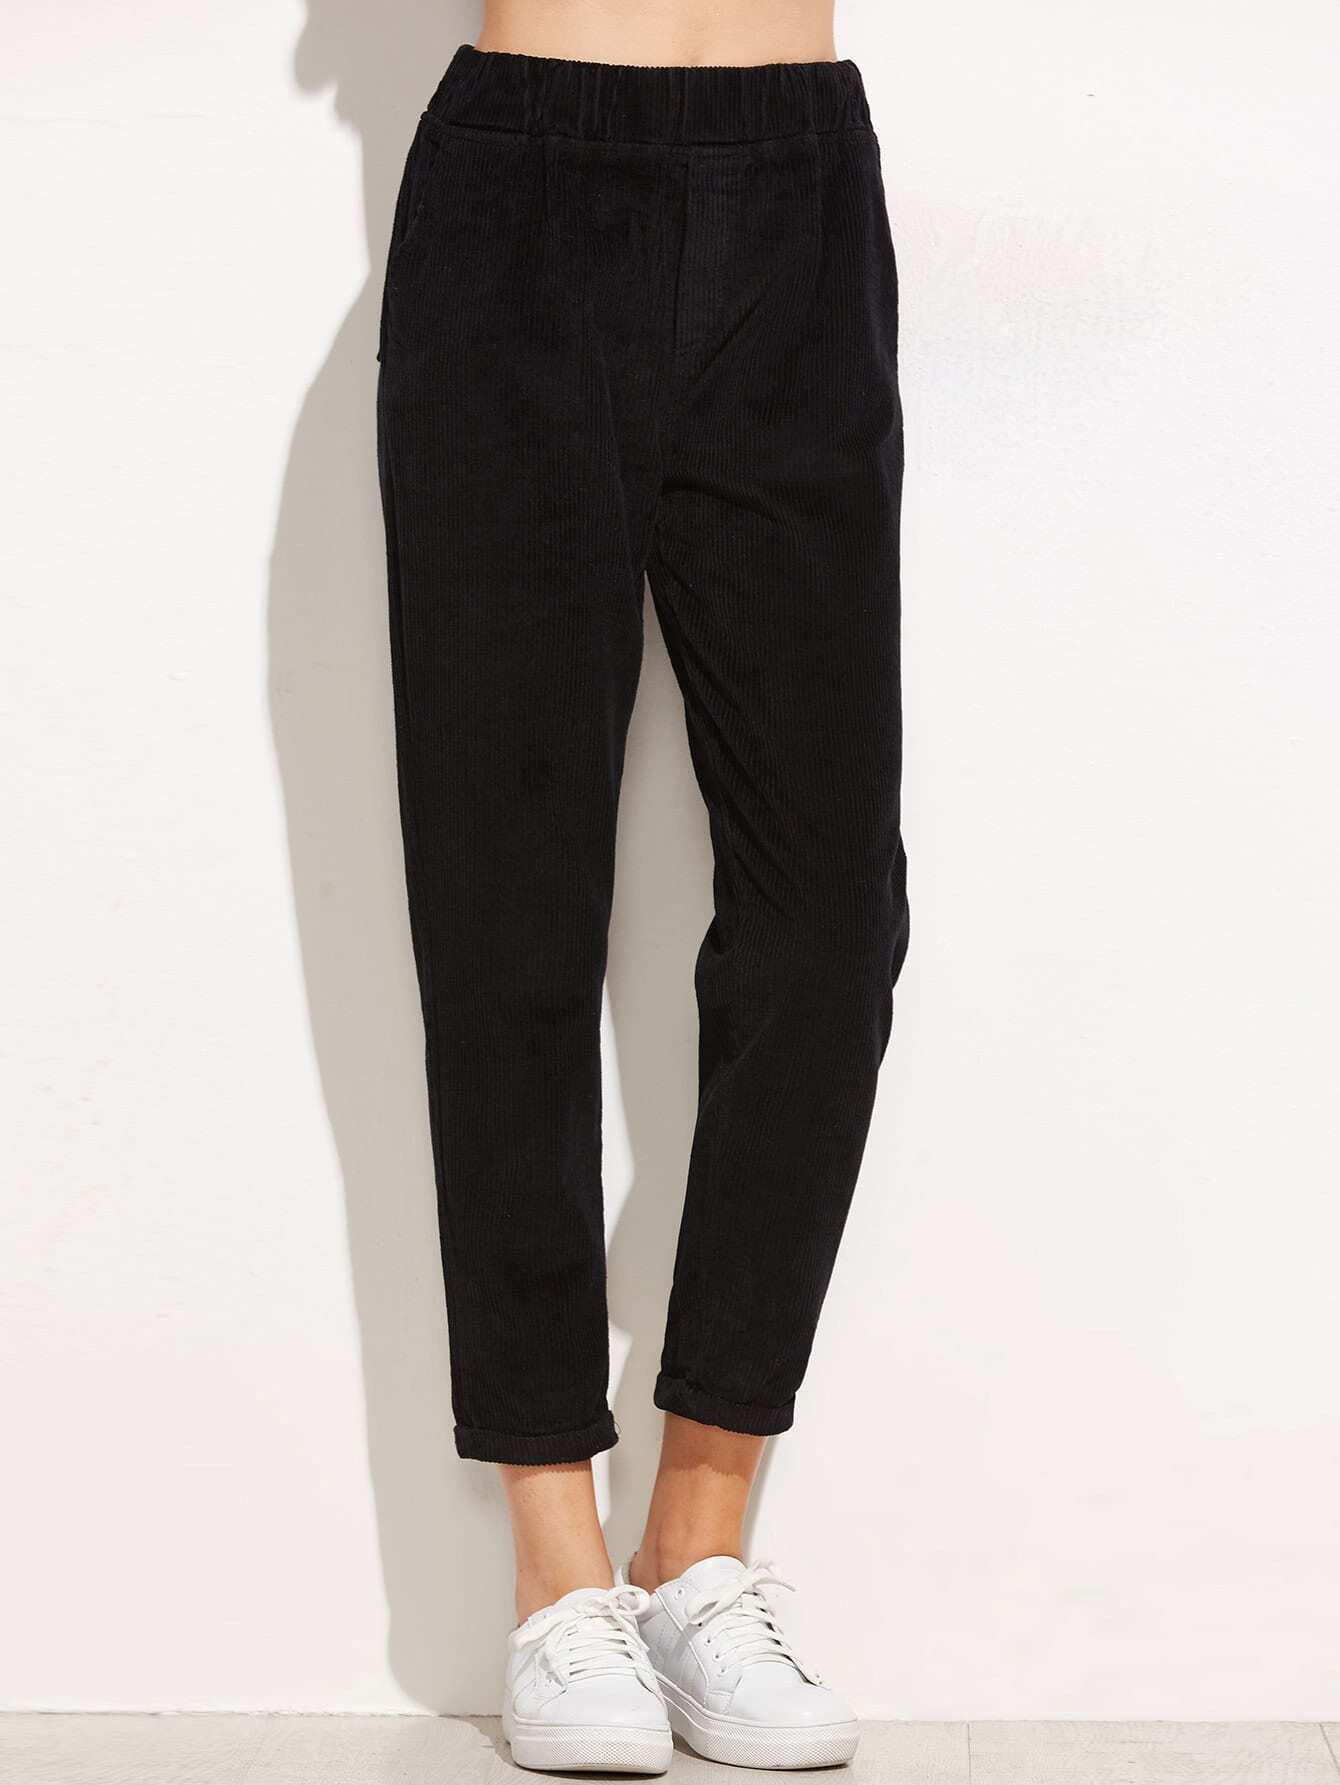 Black Elastic Waist Cuffed Corduroy Pants -SheIn(Sheinside)